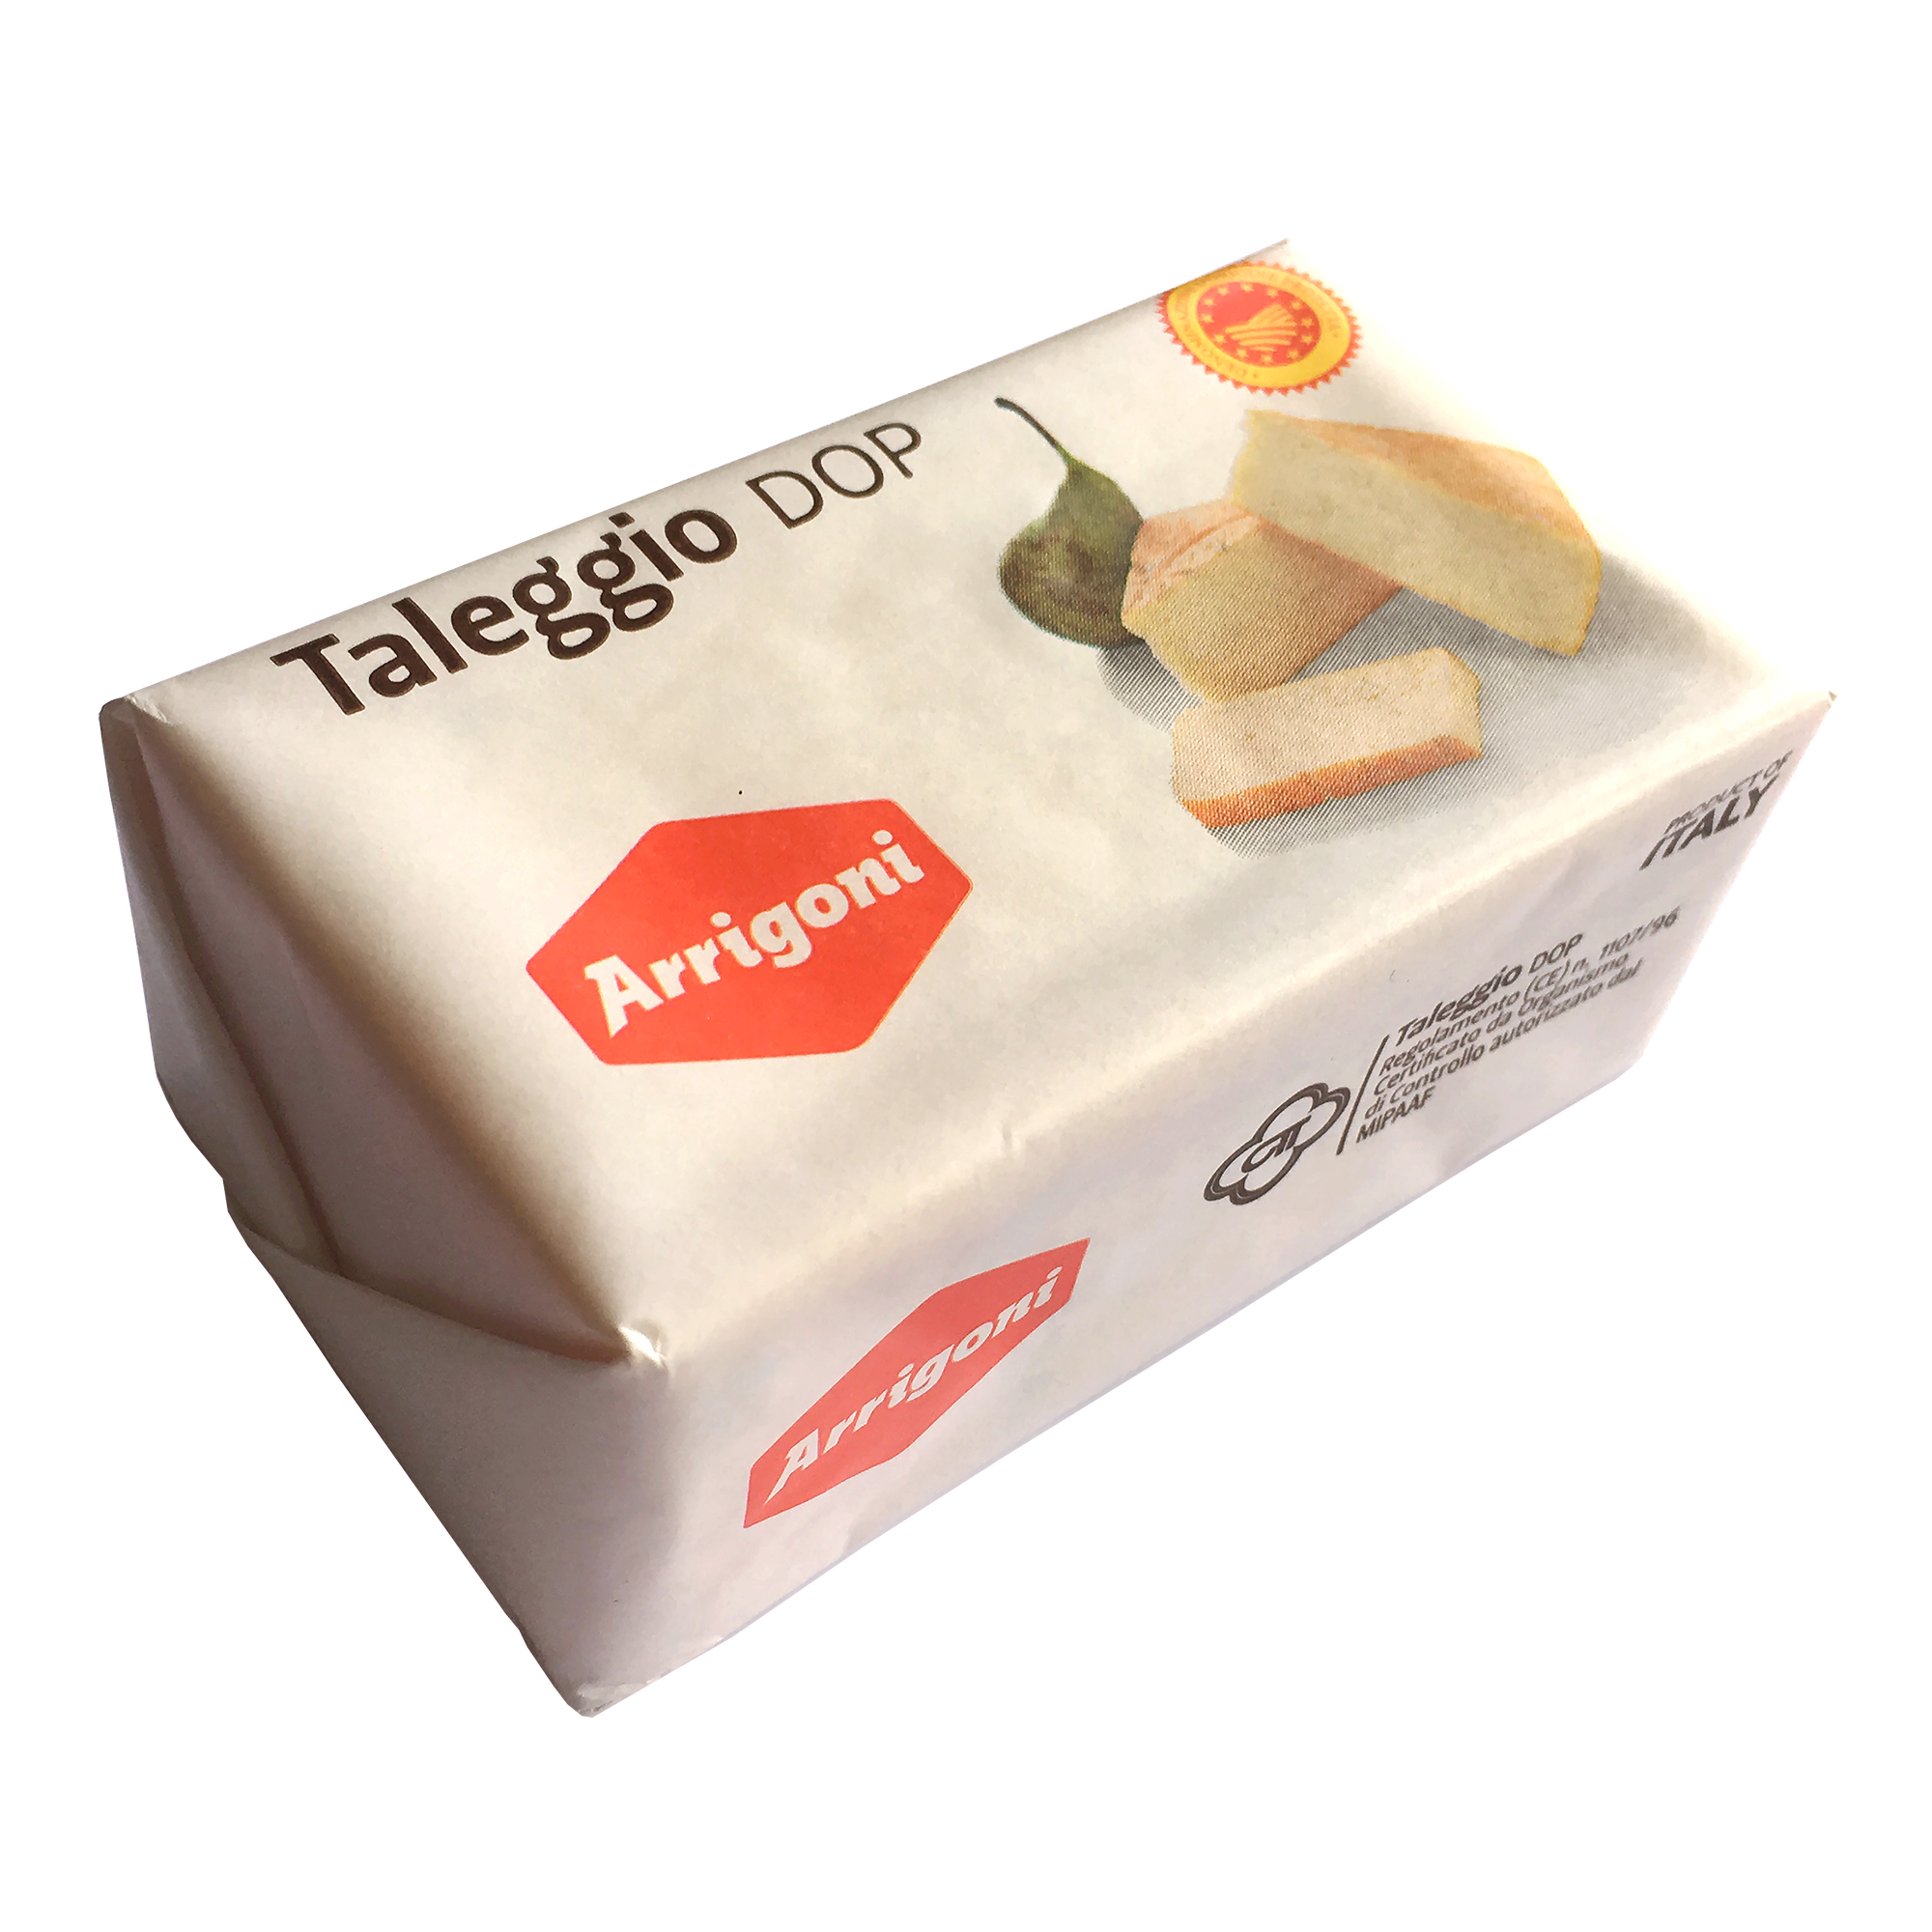 Italienischer Taleggio D.O.P. 200g